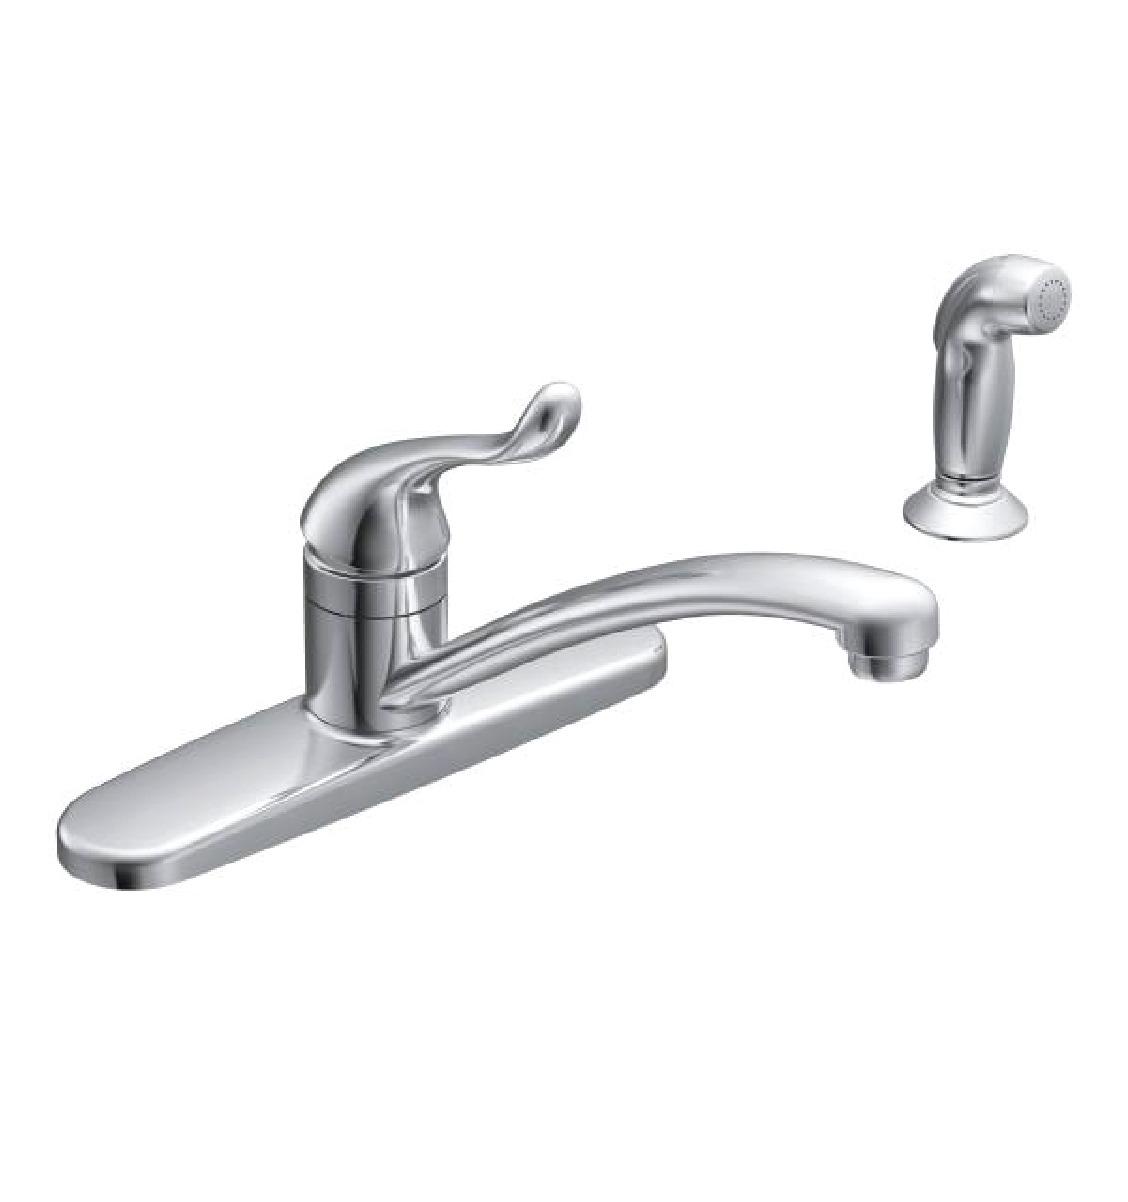 Moen Ca87530 Adler Onehandle Low Arc Kitchen Sink Faucet Hdr Image Parts List And Diagram Ereplacementpartscom